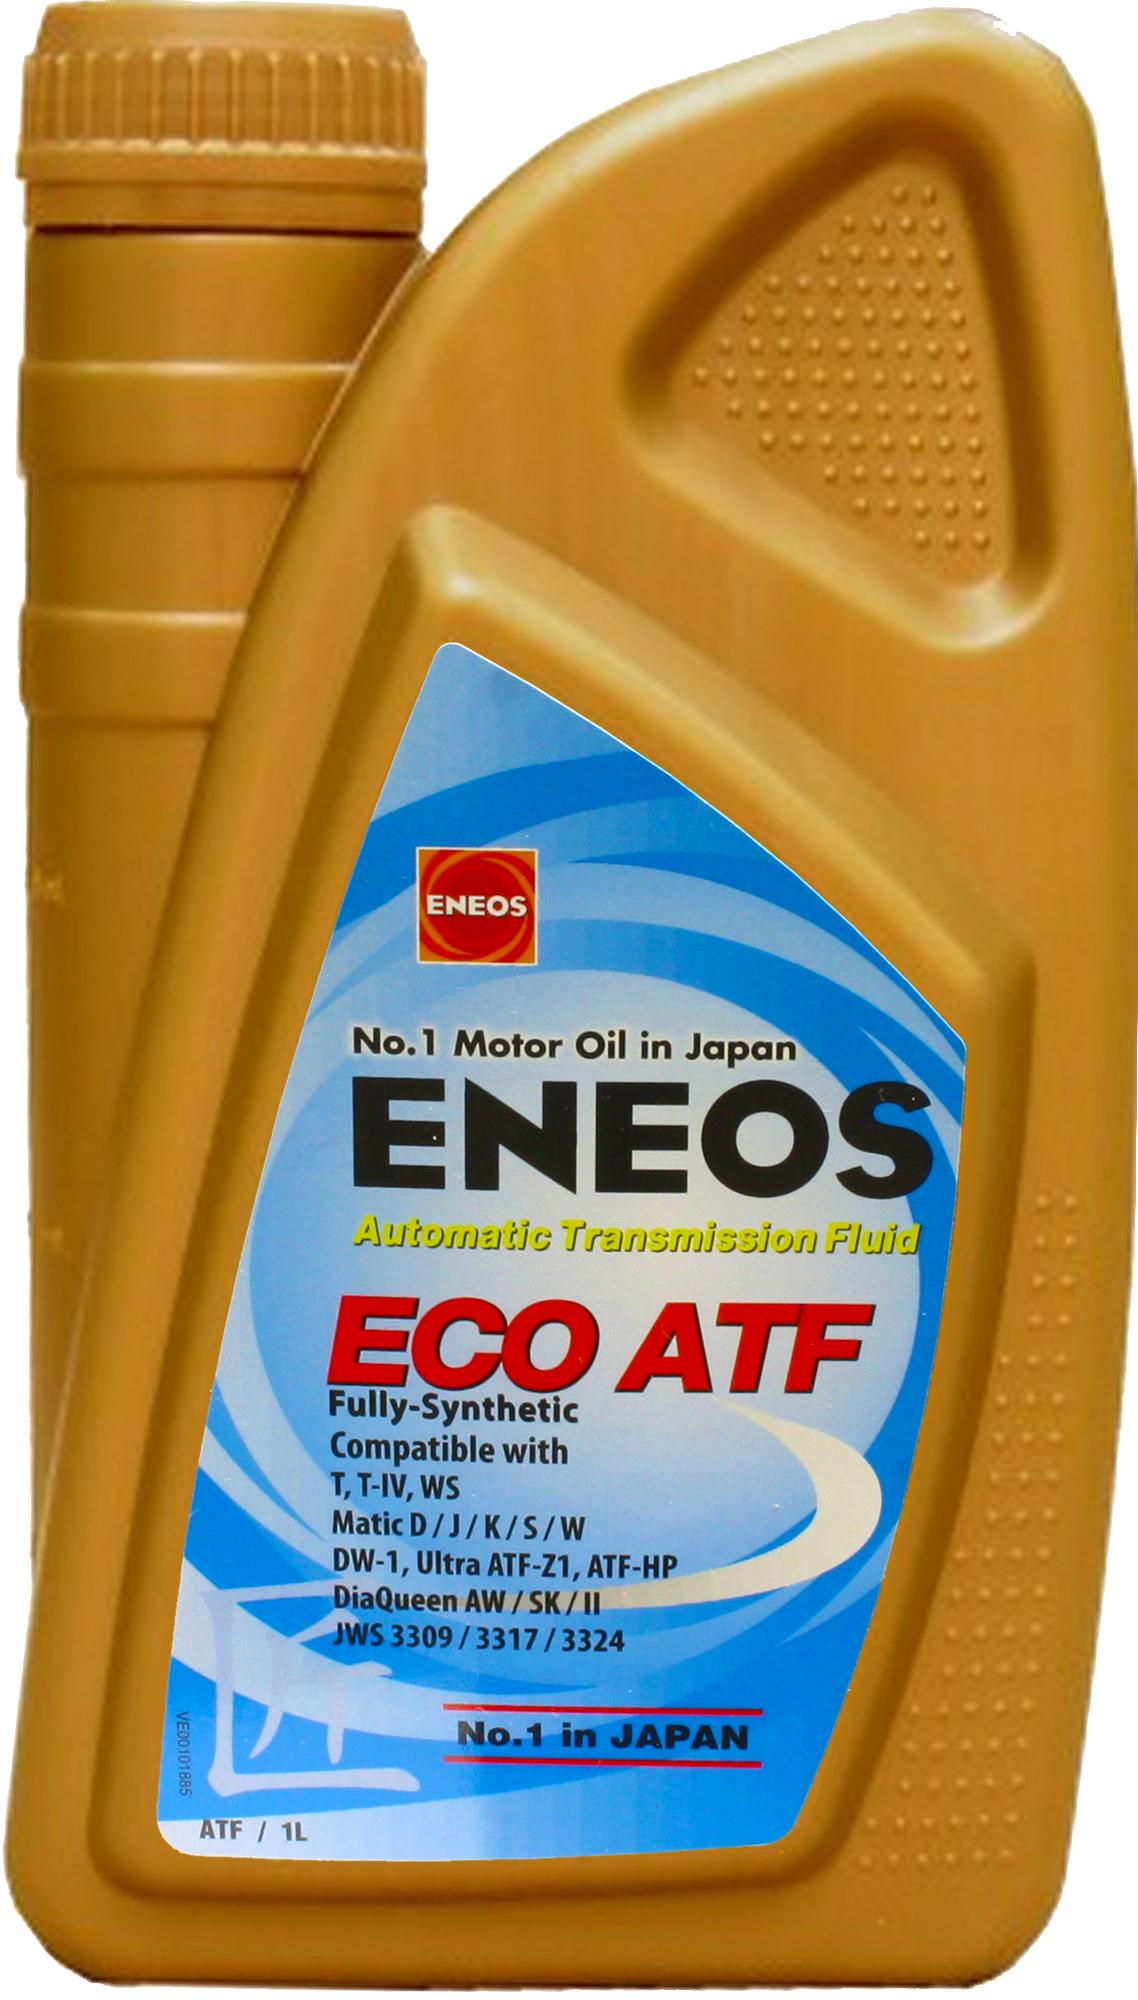 ENEOS ECO ATF automataváltó olaj